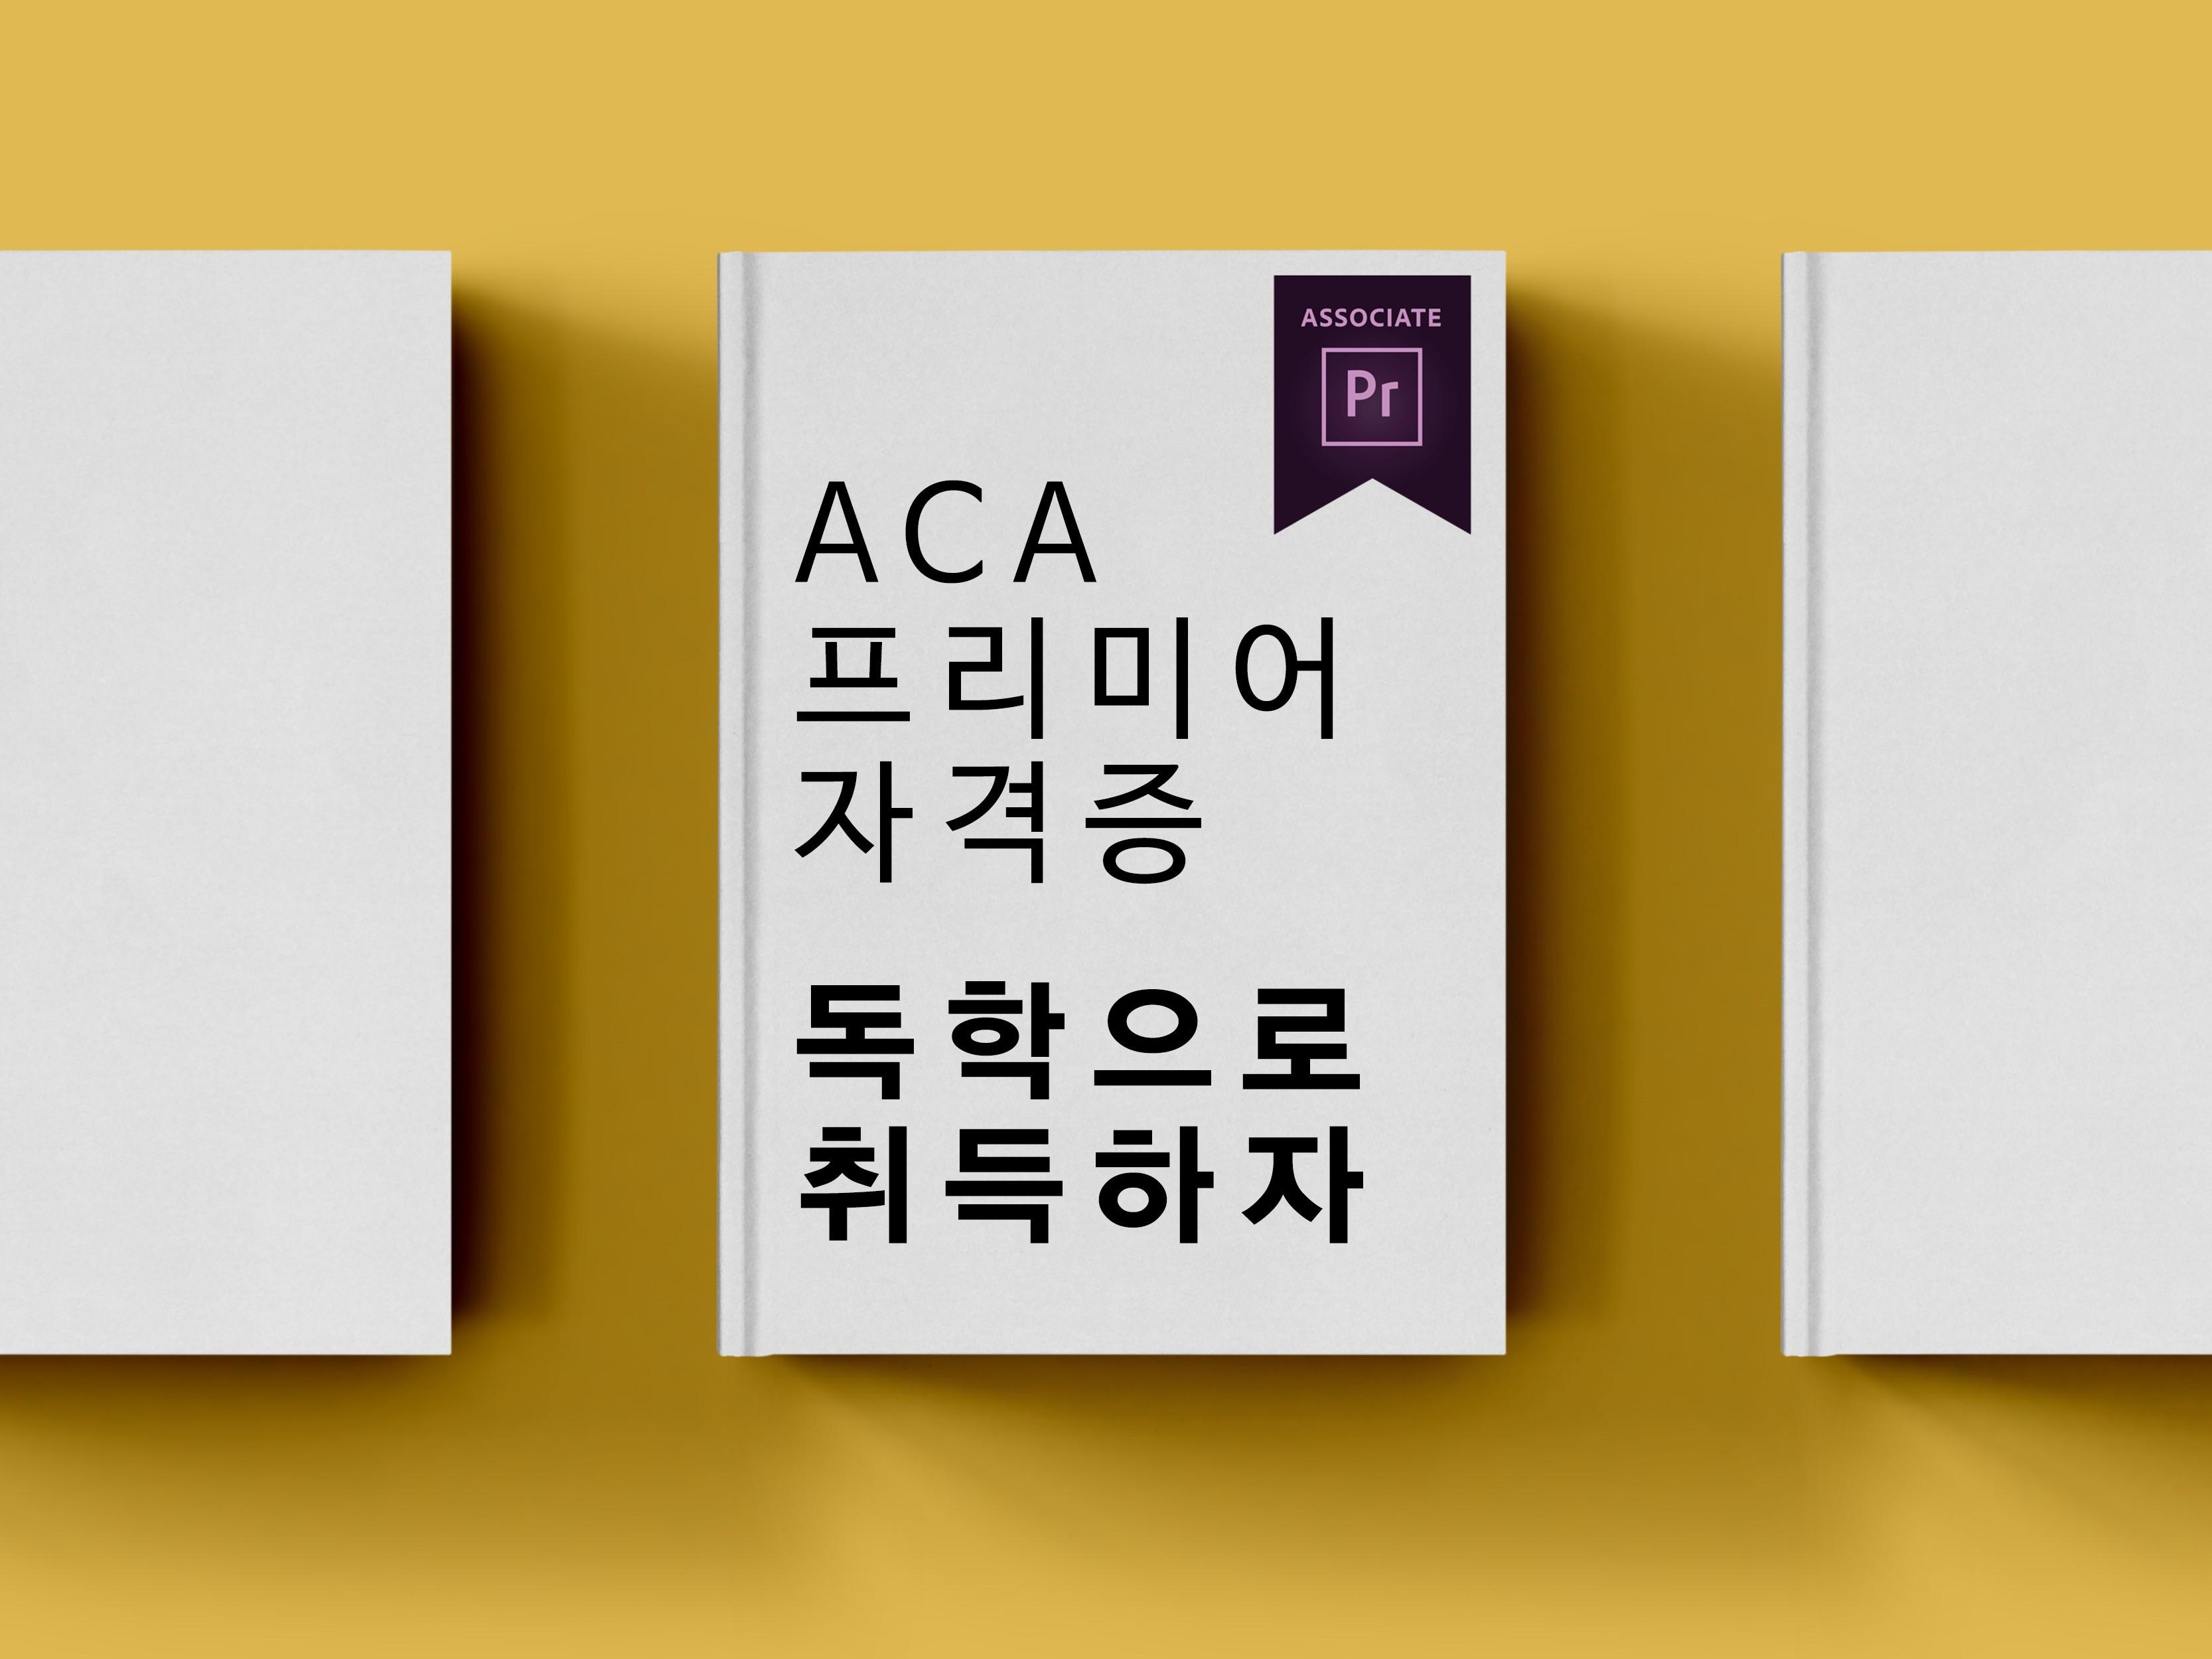 ACA Premiere 프리미어 자격증 취득 독학노하우 드립니다.